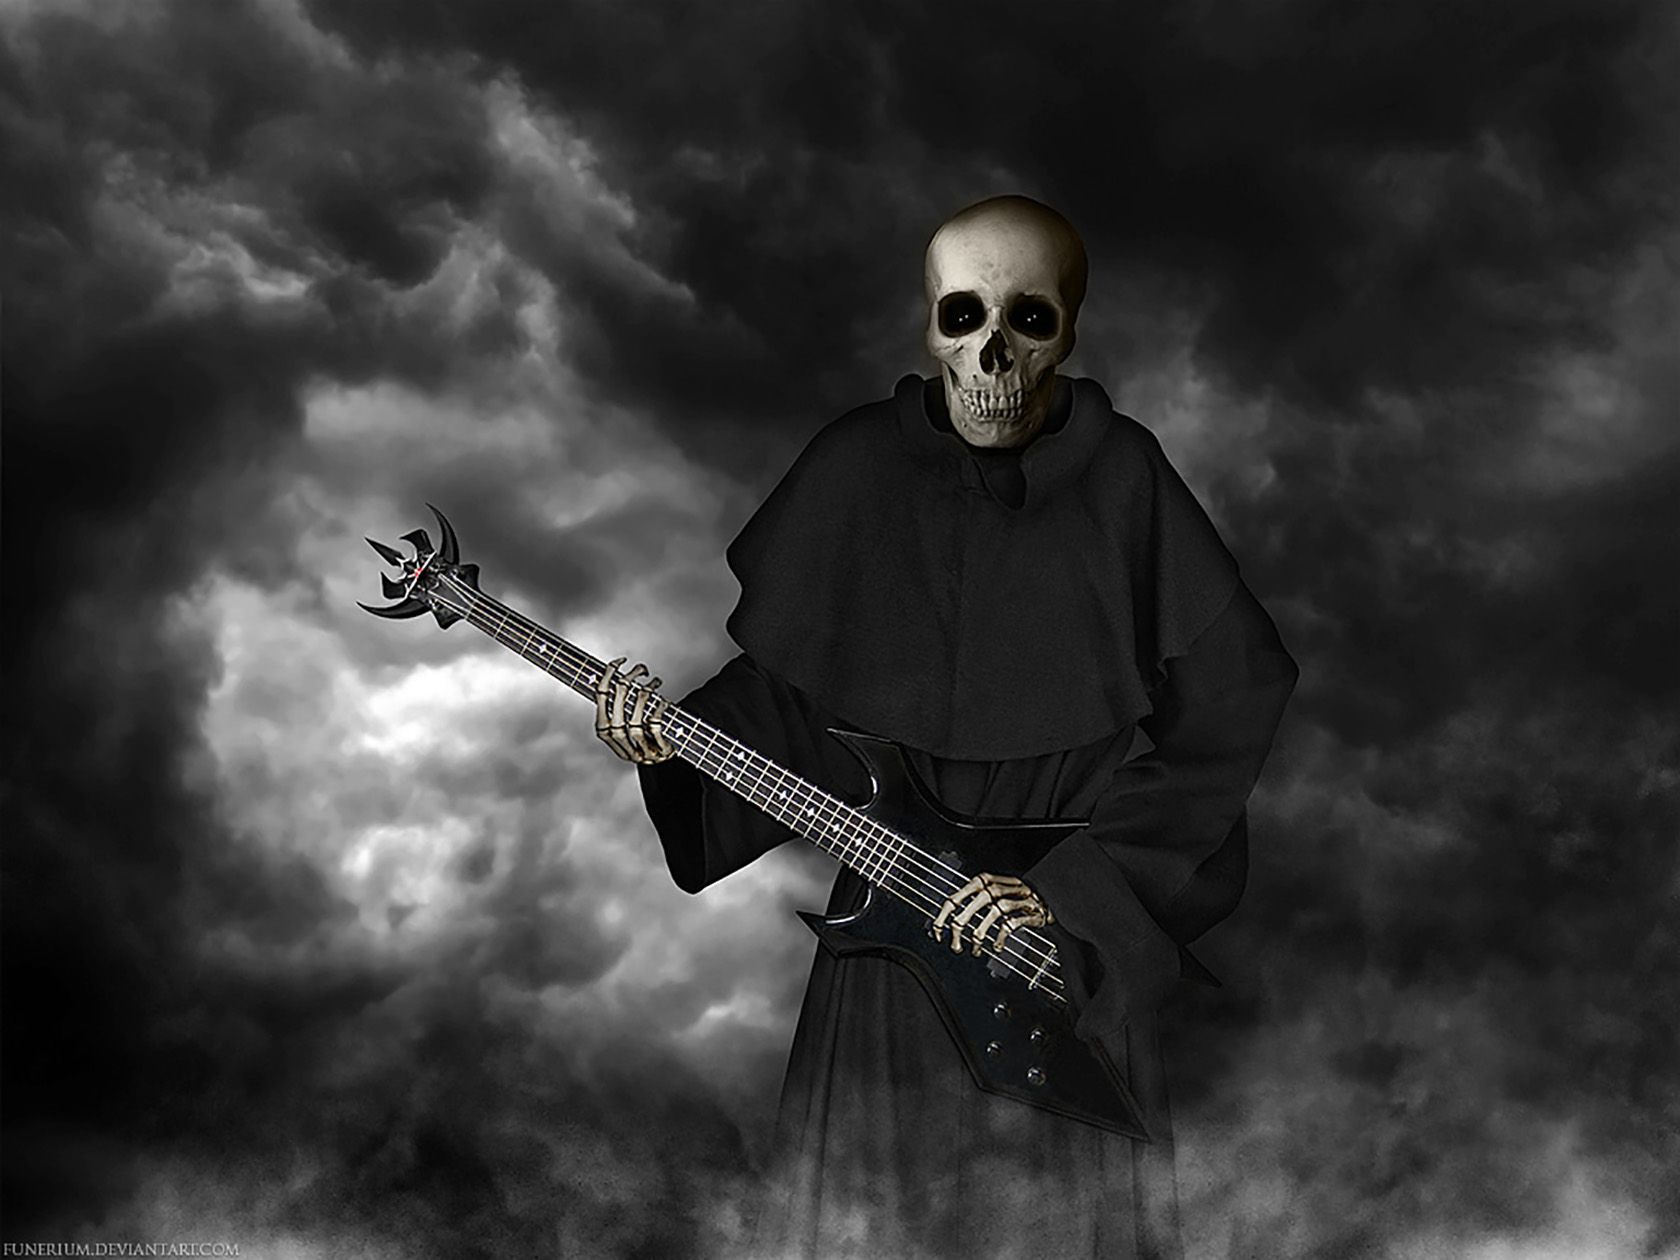 Rock-N-Roll-The-Grim-Reaper-D-wallpaper-wp4007155-1